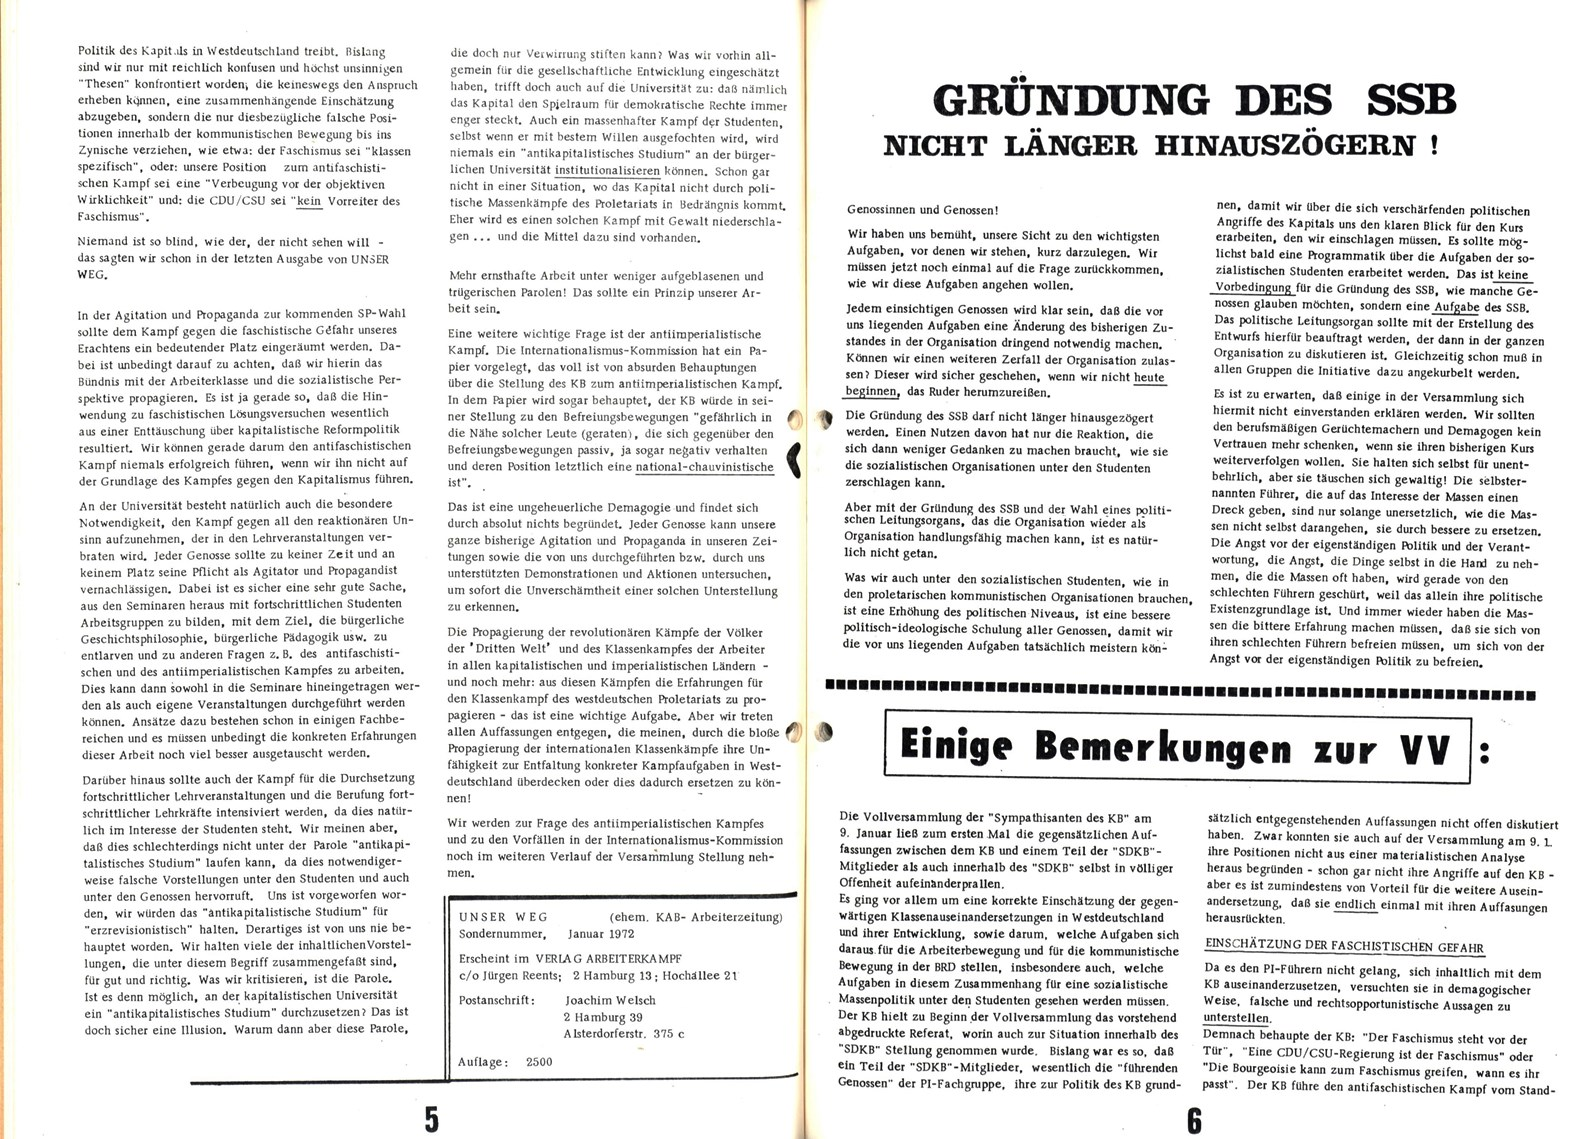 KB_Unser_Weg_19720100_Sonder_04